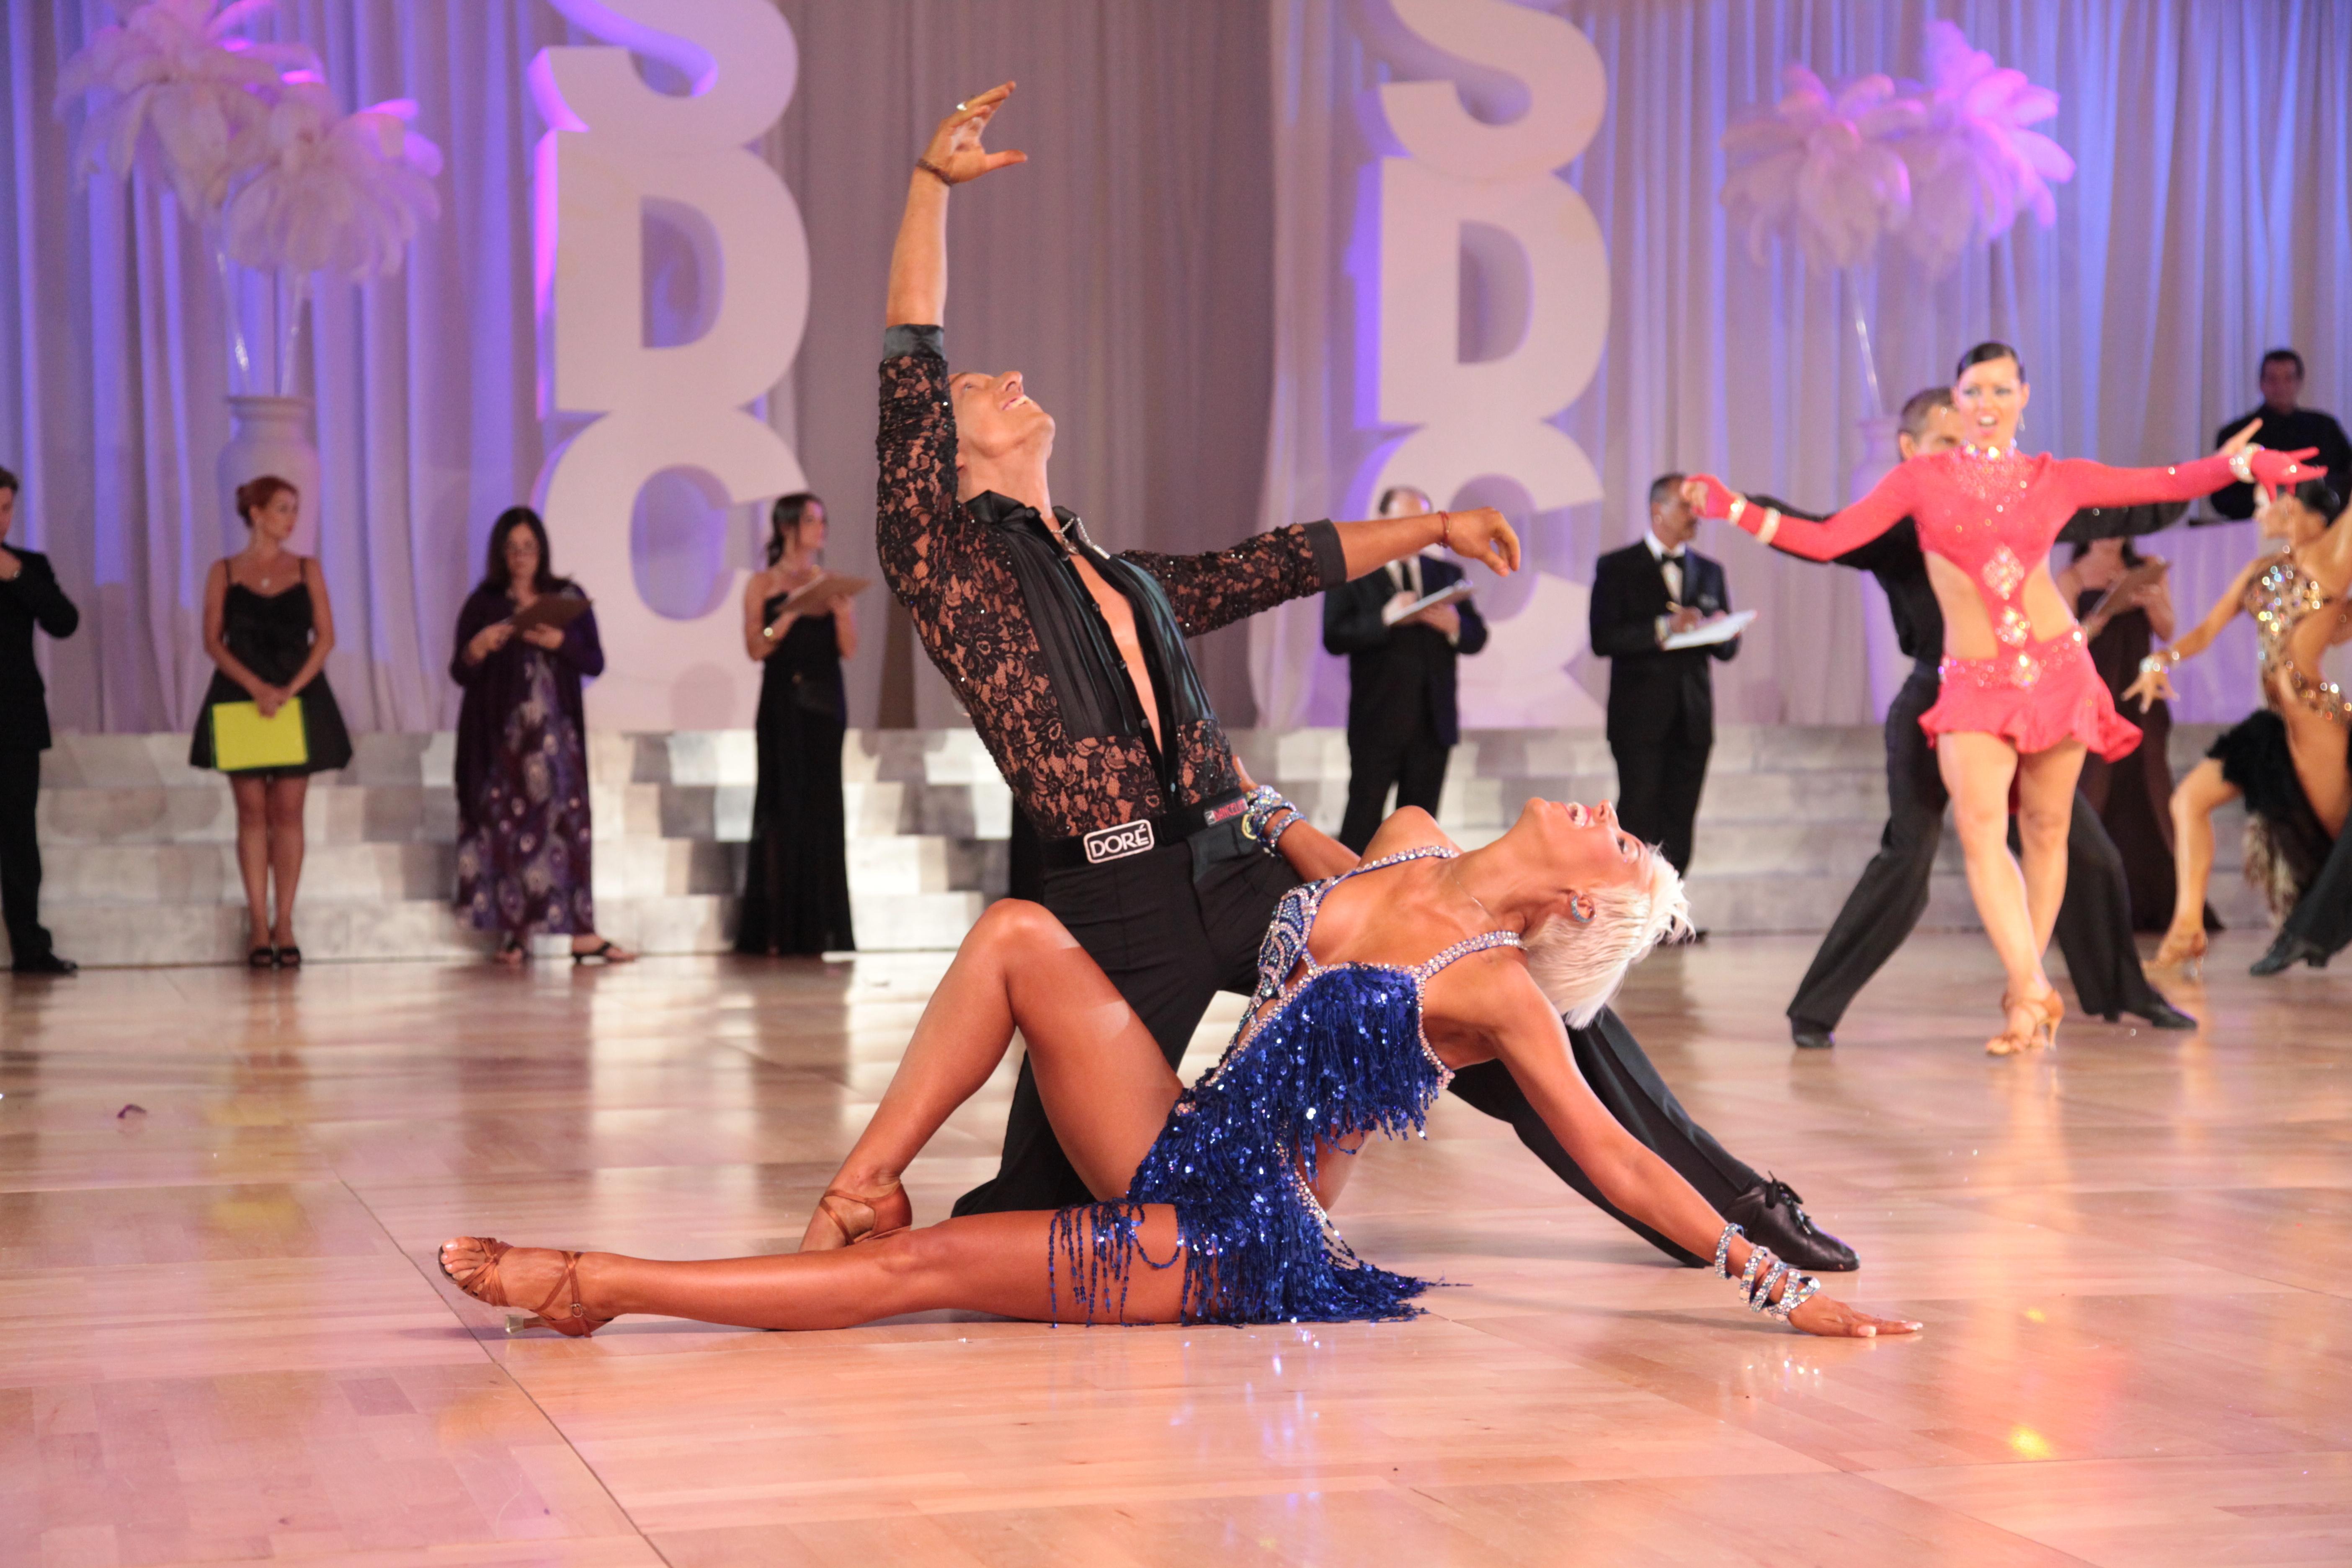 Amanda Reyzin U.S. 9-Dance Champion